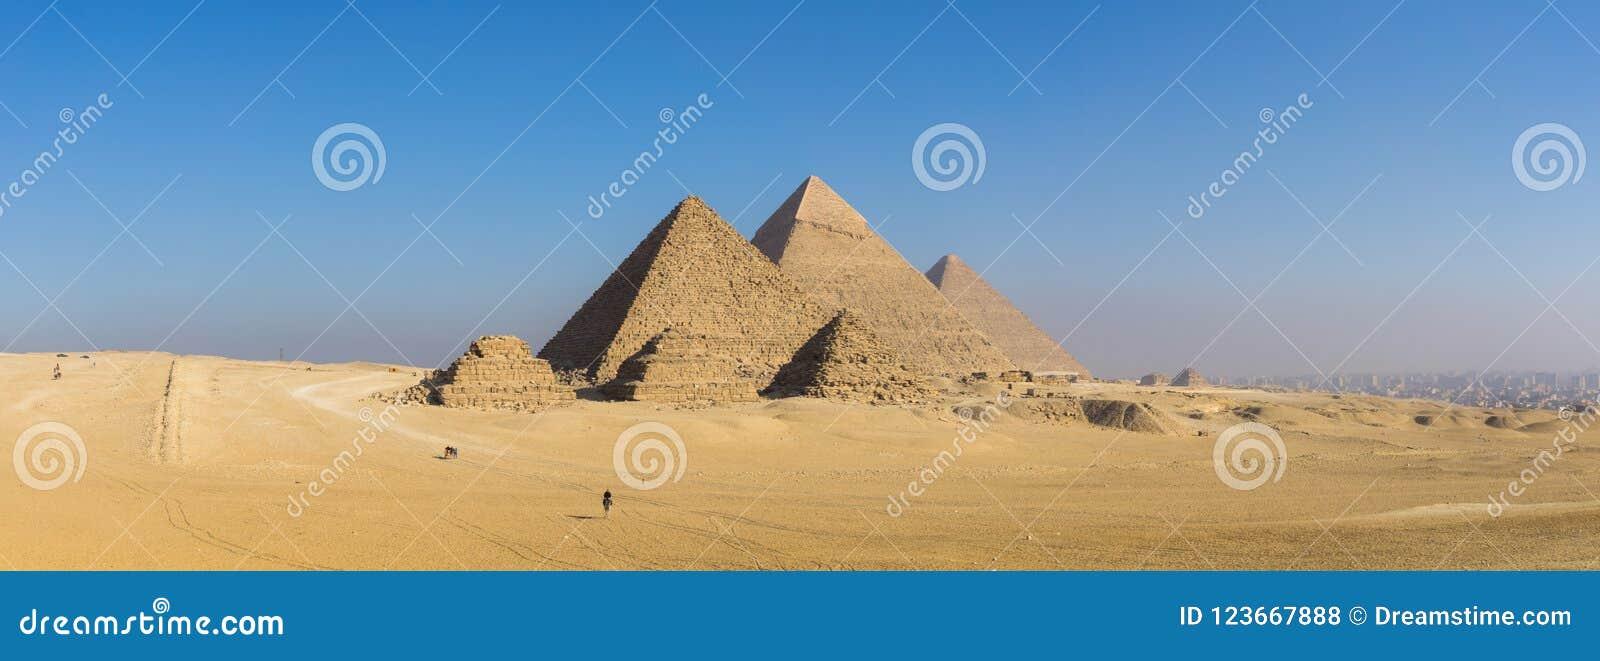 De grote Piramide van Giza en Sfinx, Kaïro, Egypte